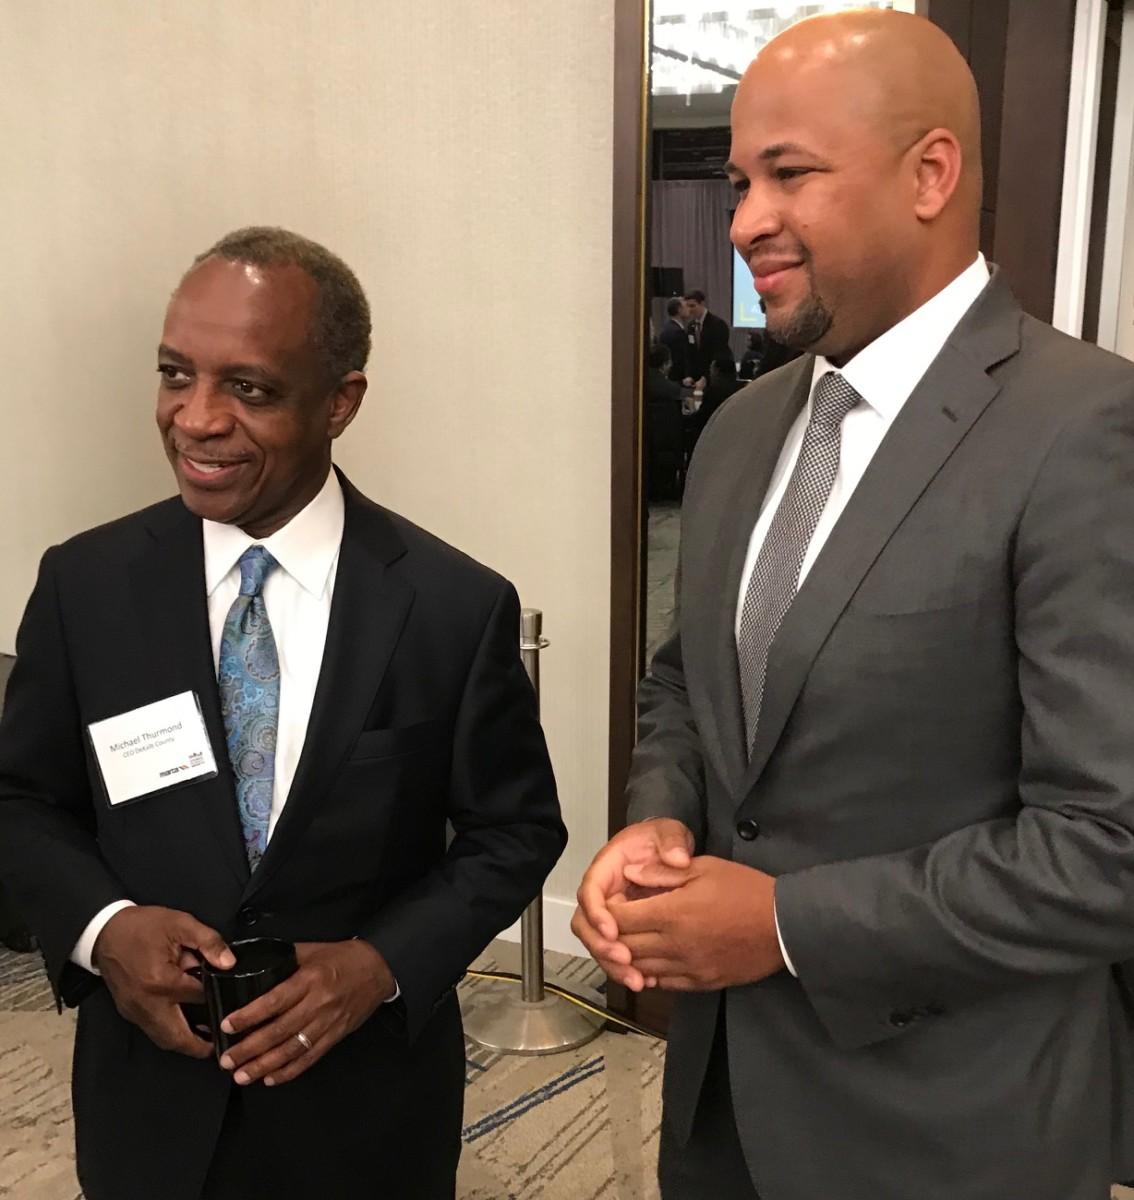 DeKalb County CEO Michael Thurmond (left) and political strategist Tharon Johnson at the State of MARTA breakfast. Credit: Kelly Jordan